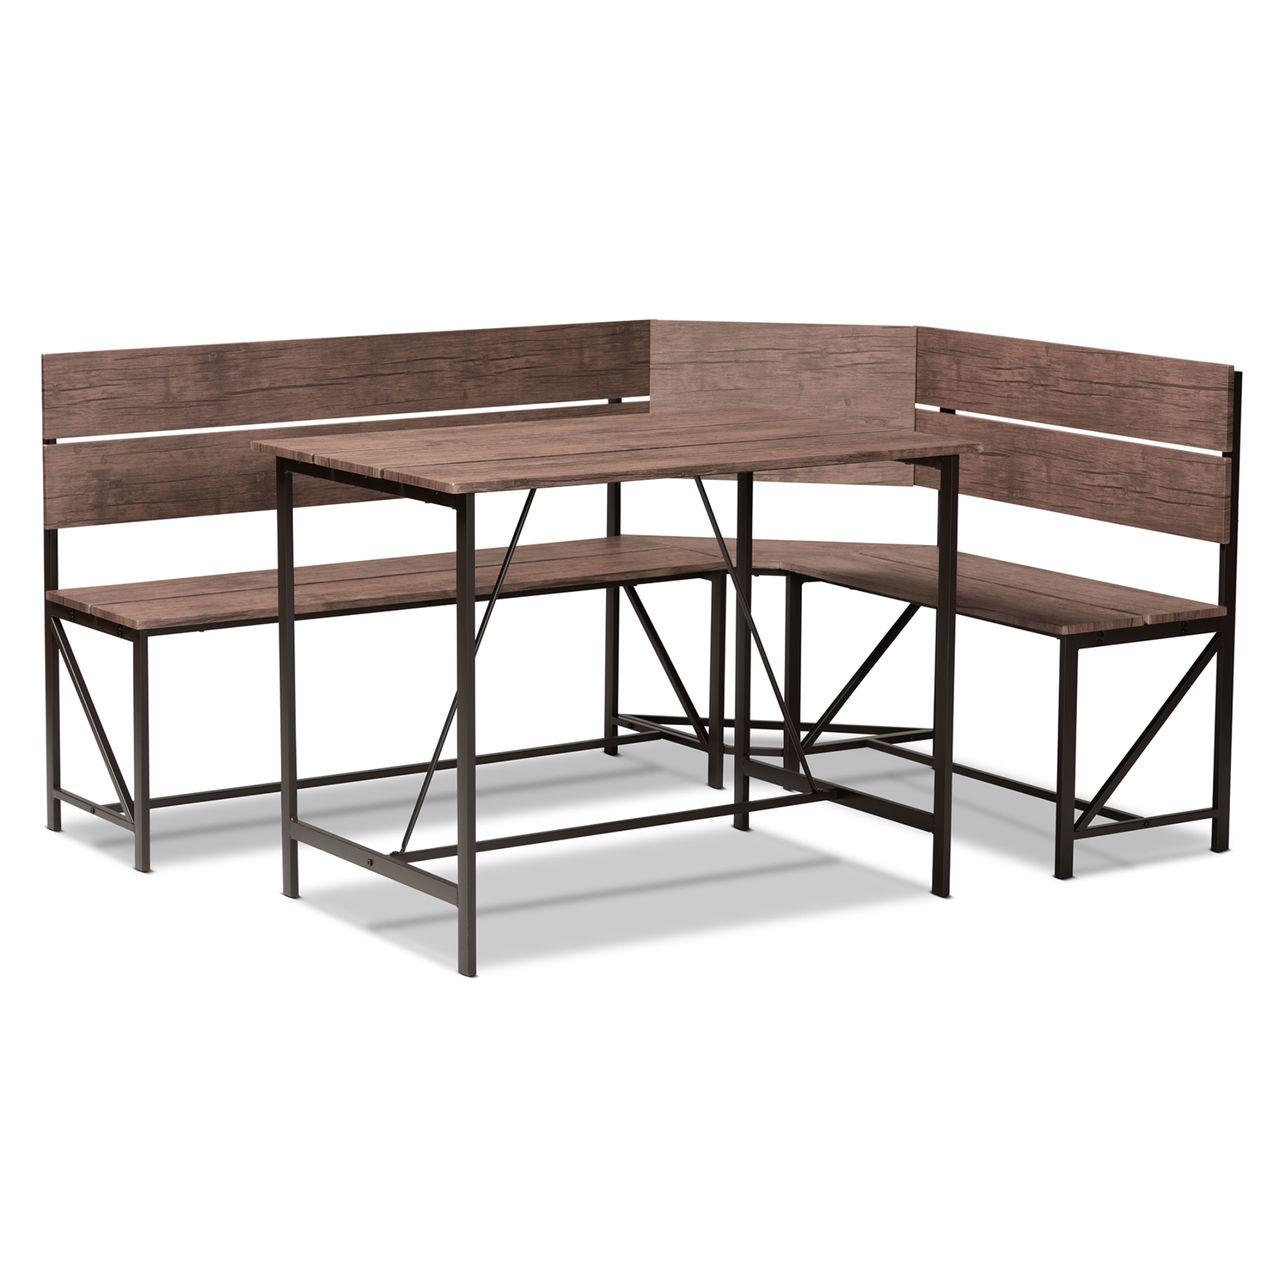 Baxton Studio Marston Metal 2-Piece Dining Nook Set - Brown Wood/Black